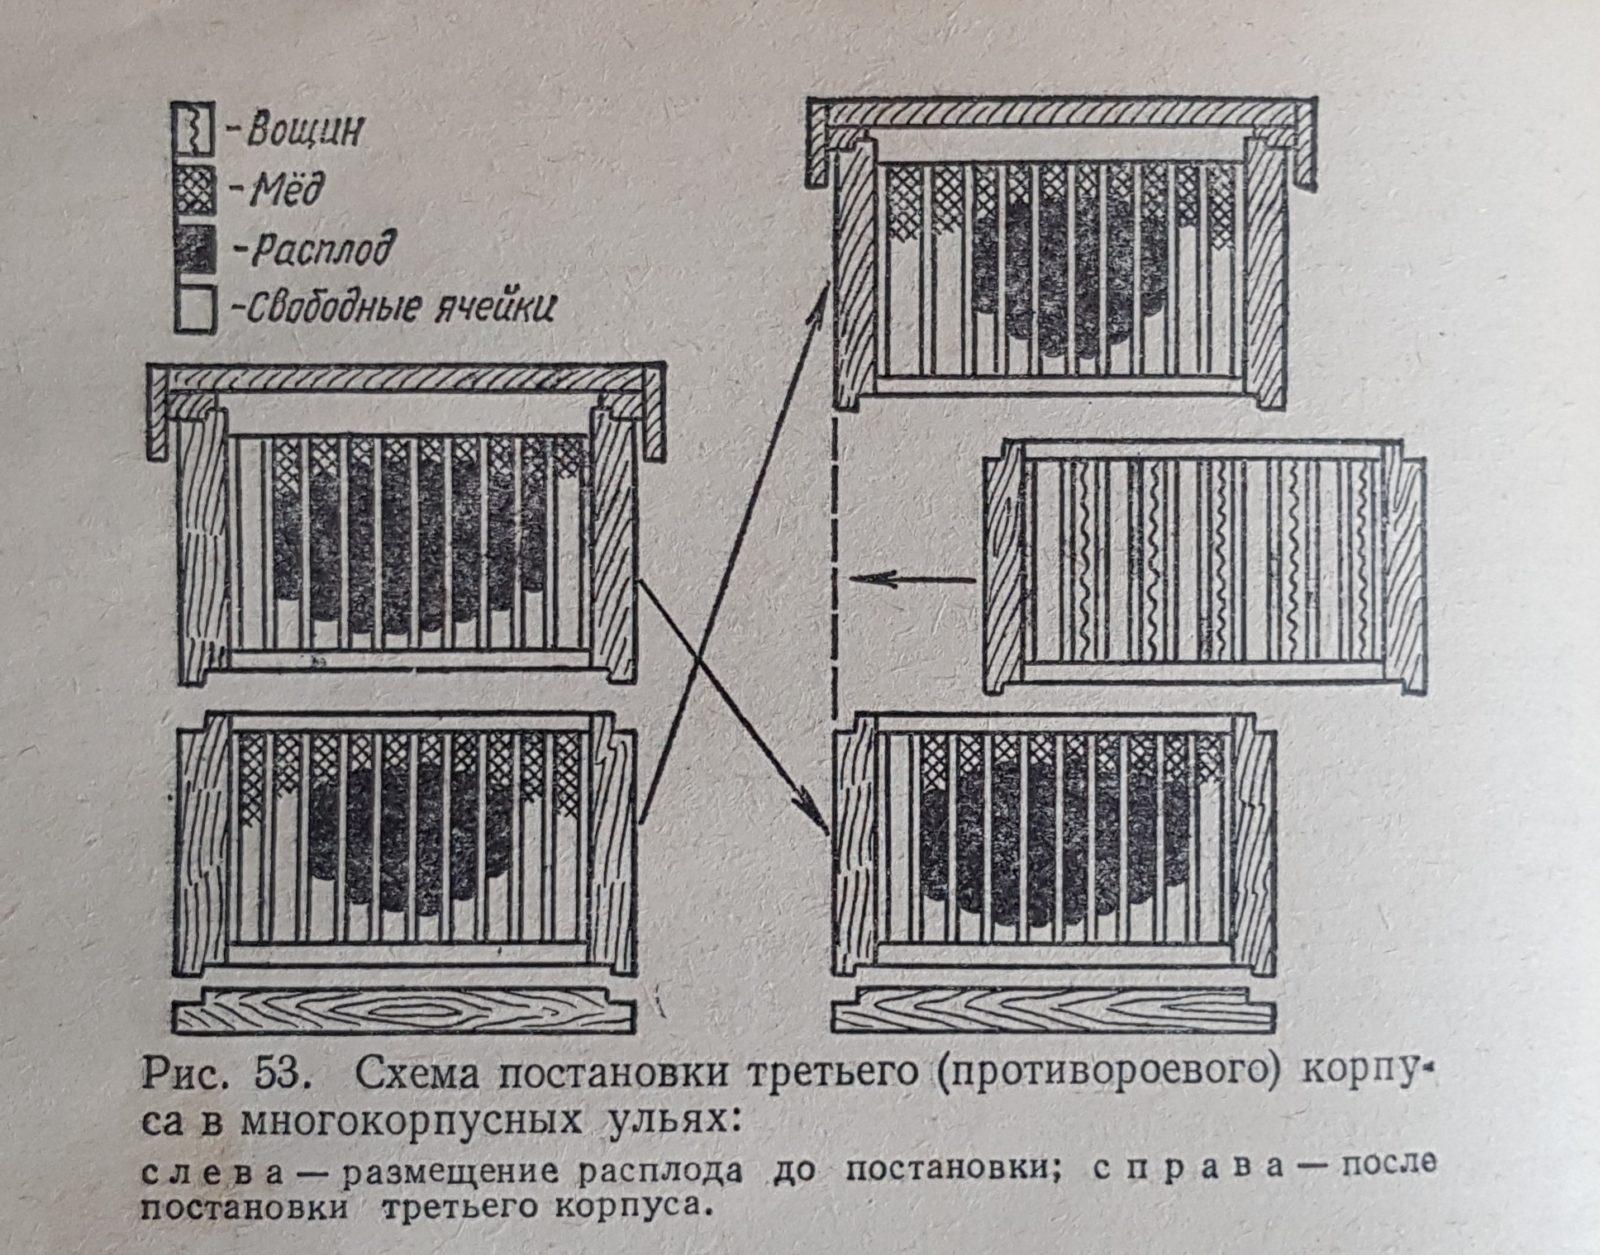 Схема постановки третьего корпуса